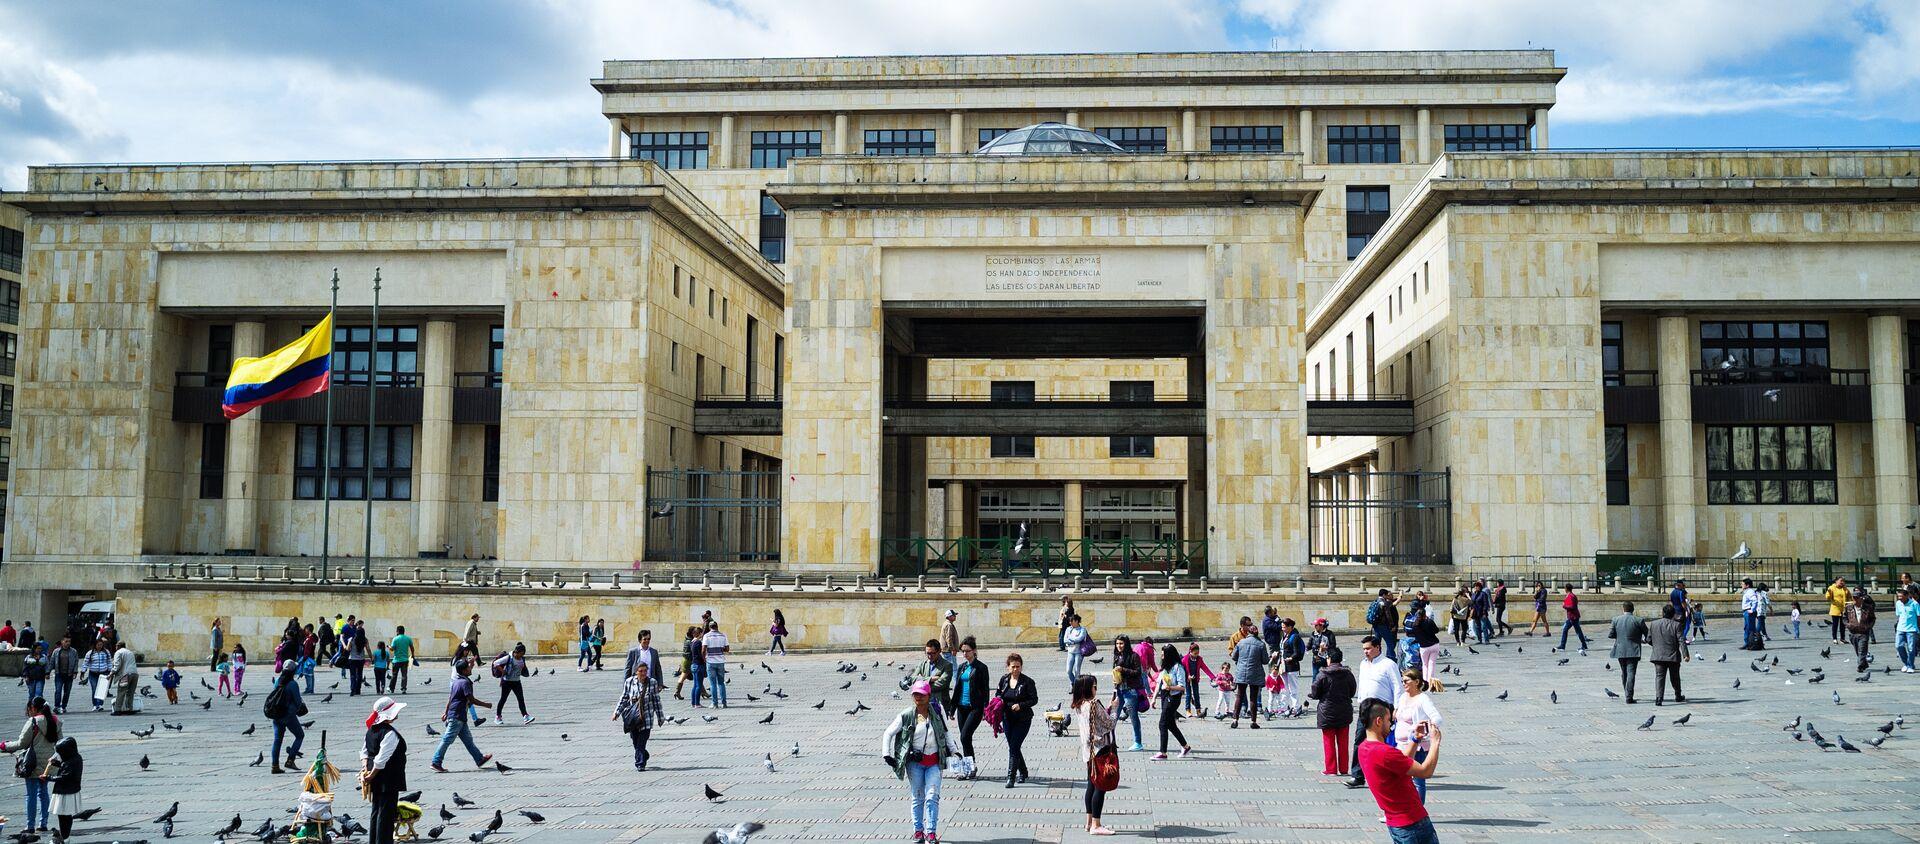 Palacio de Justicia, Bogotá - Sputnik Mundo, 1920, 09.10.2020